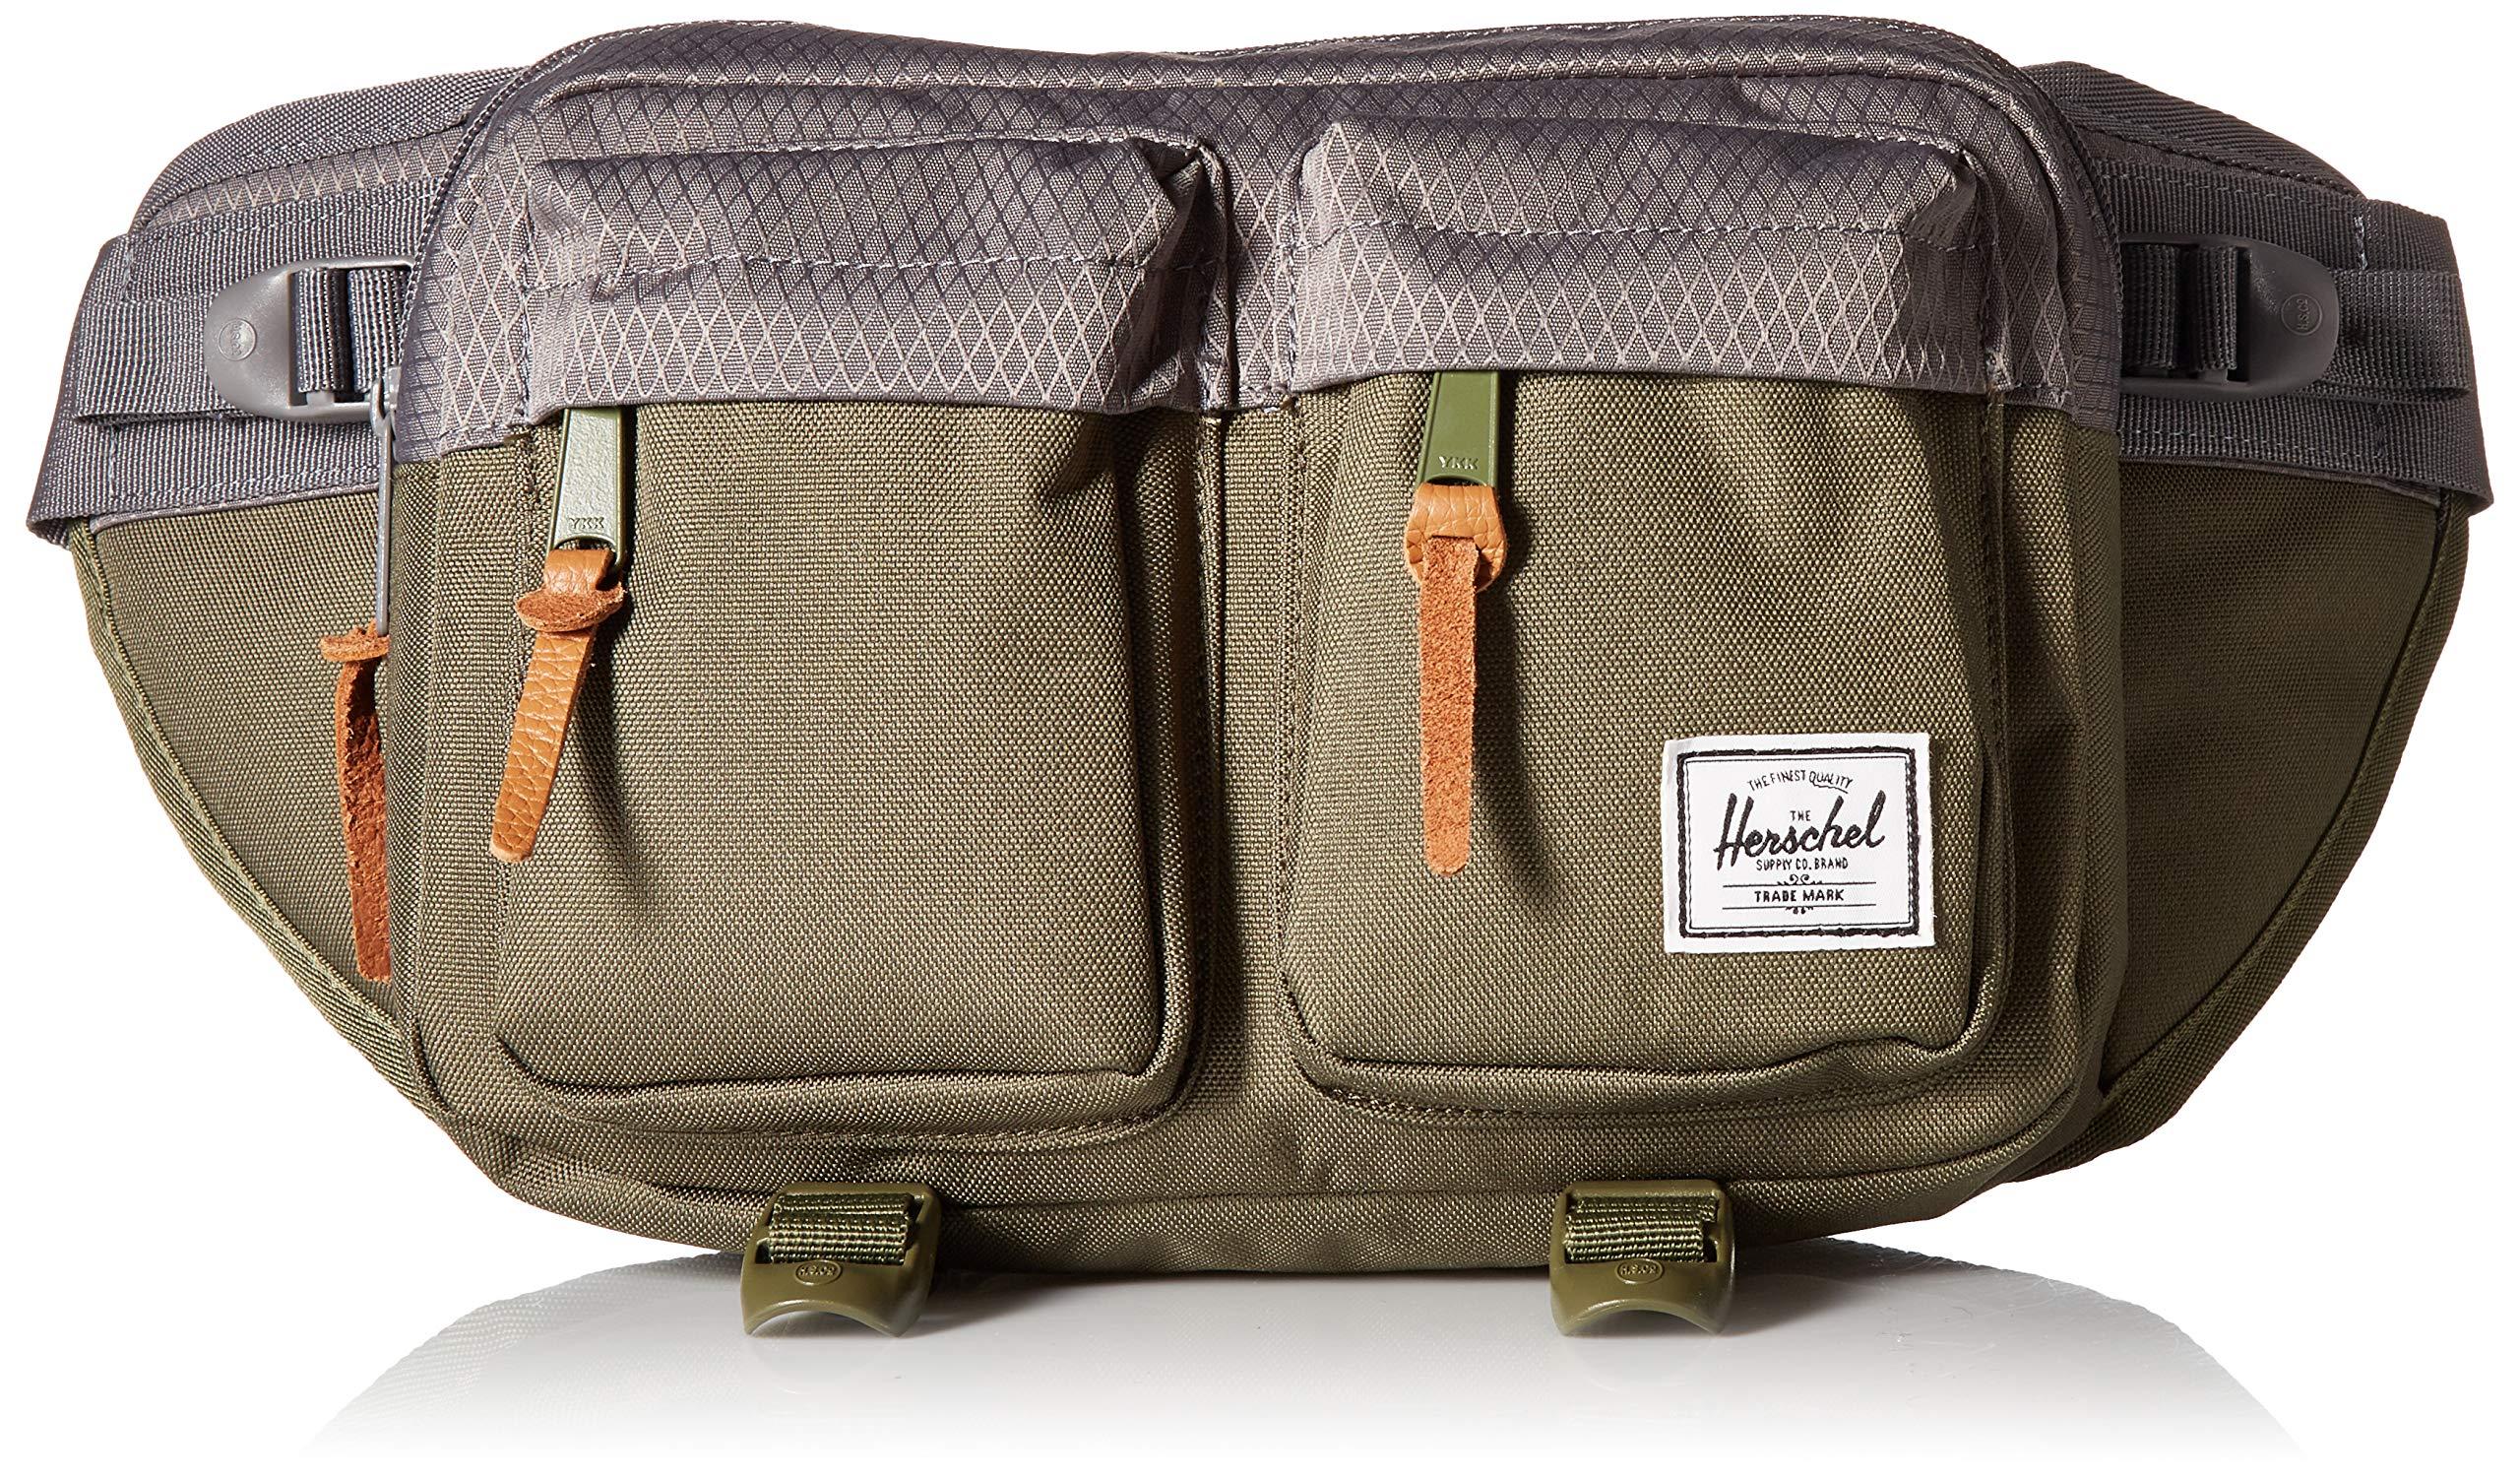 Herschel Supply Co. Eighteen Waist Pack, Ivory Green/Smoked Pearl, One Size